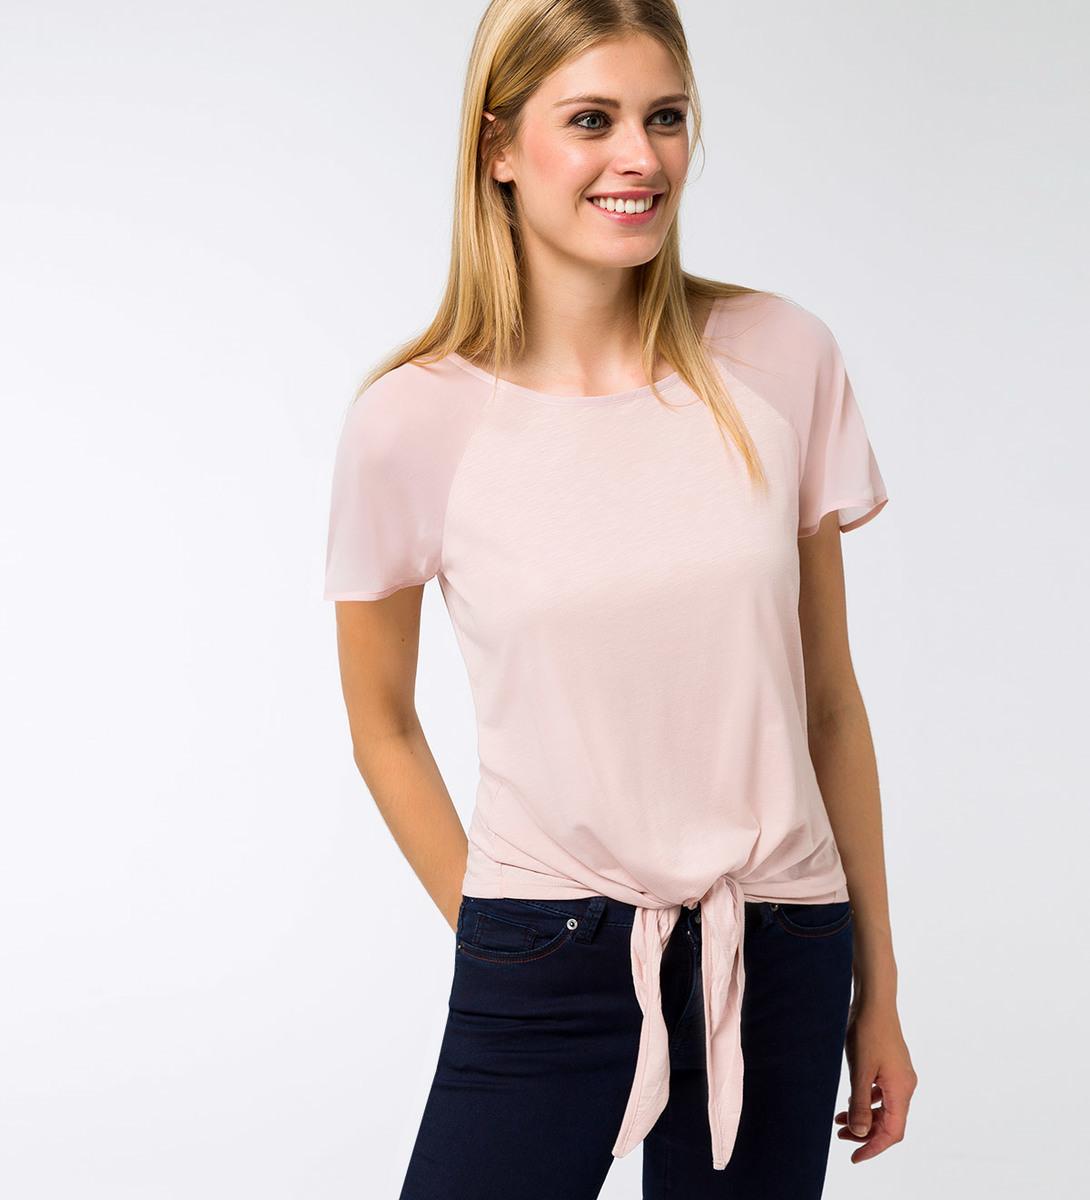 T-Shirt mit transparenten Ärmeln in soft rose